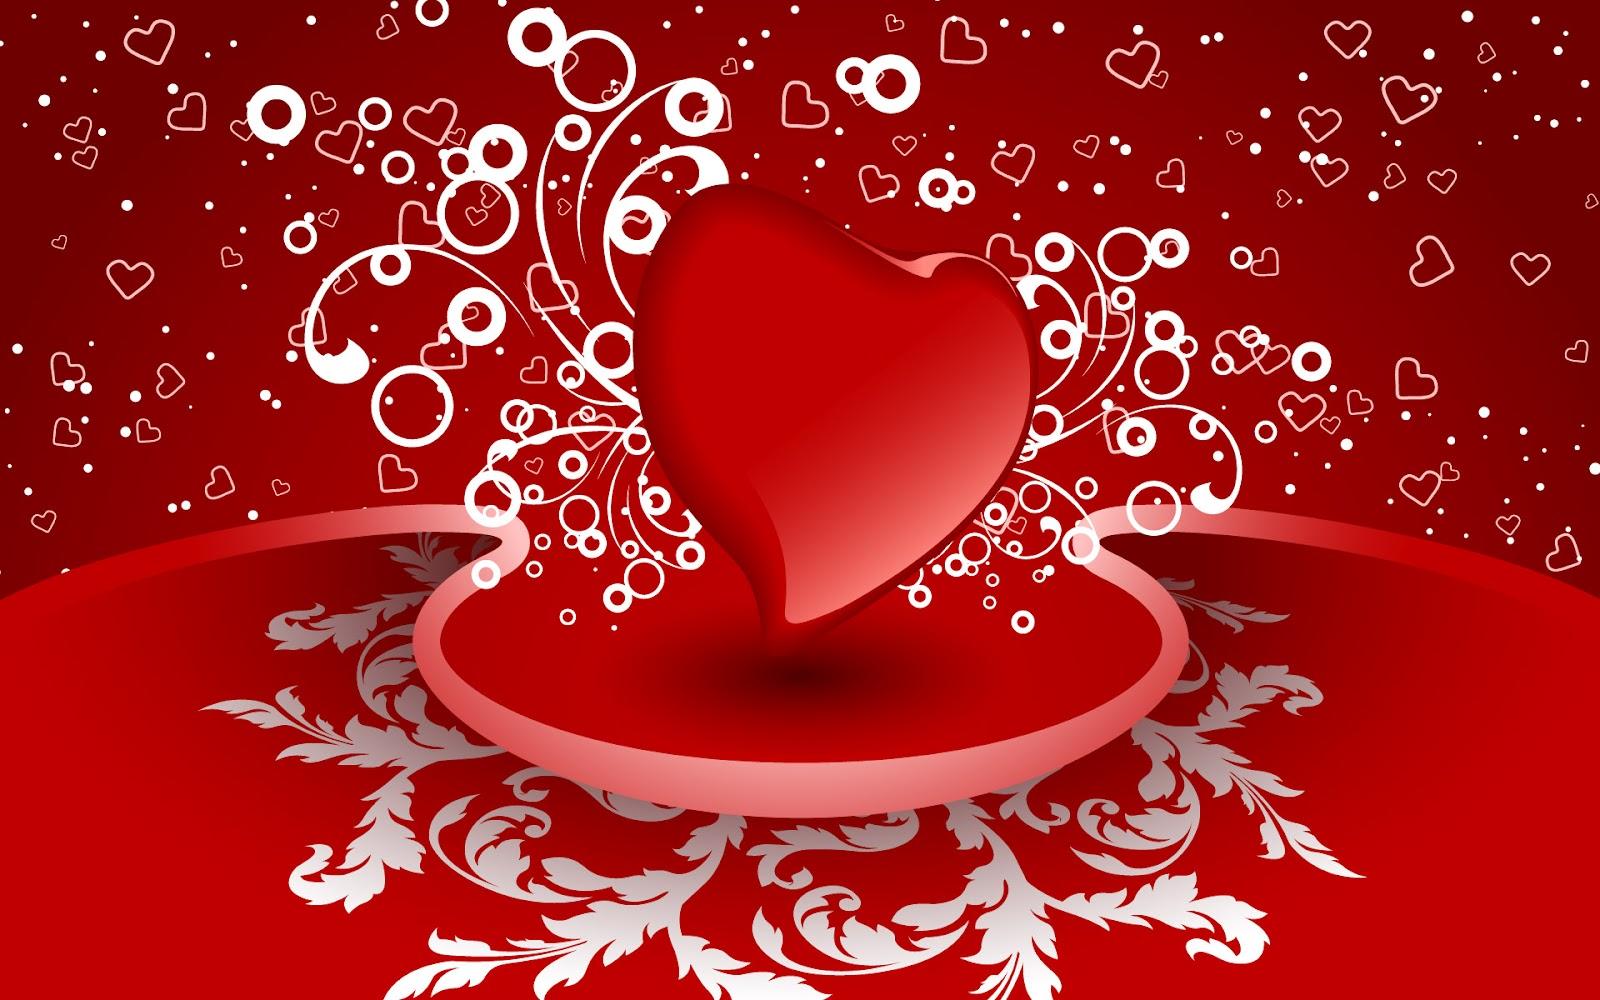 http://1.bp.blogspot.com/-AIcF36iLCdE/T-6s7qeATbI/AAAAAAAAB3Y/bHagq29R9C4/s1600/love-red-heart-wallpaper-of-valentine-day.jpg